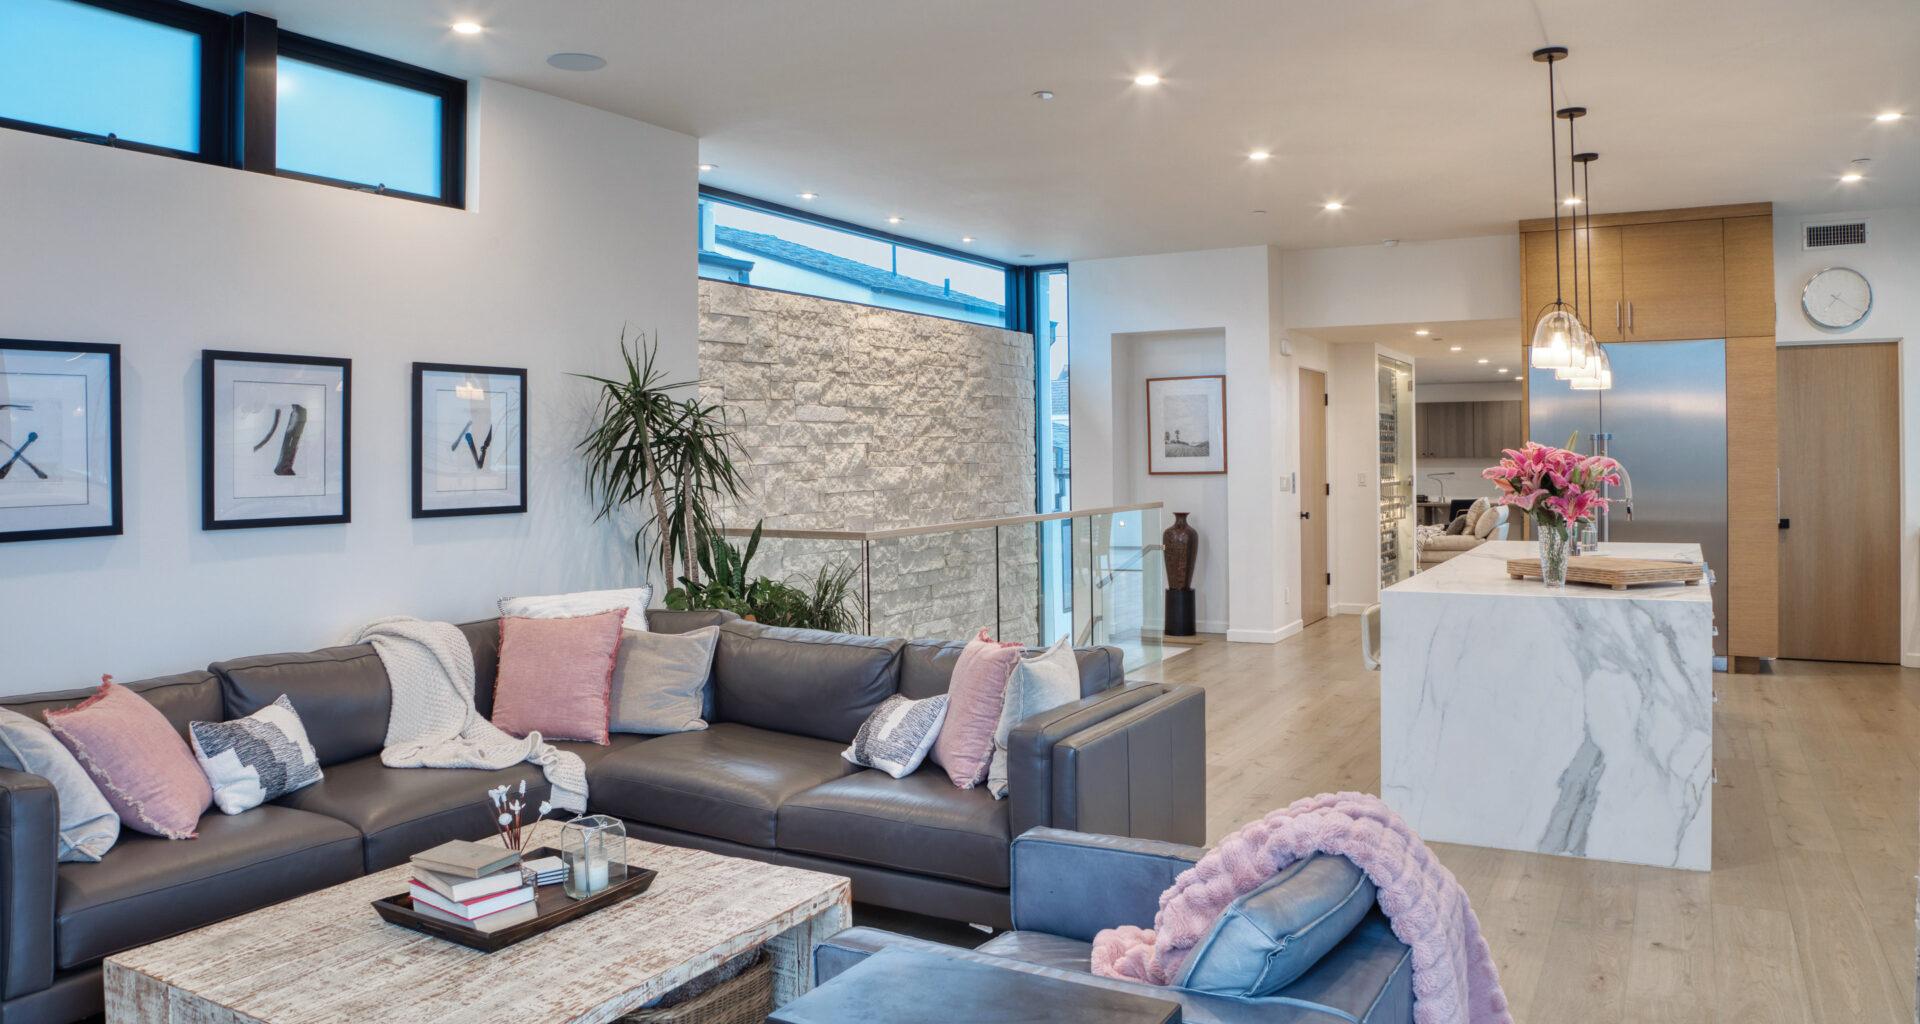 246 30th Street, Hermosa Beach, Bryn Stroyke, Stroyke Properties and Bayside Real Estate Partners